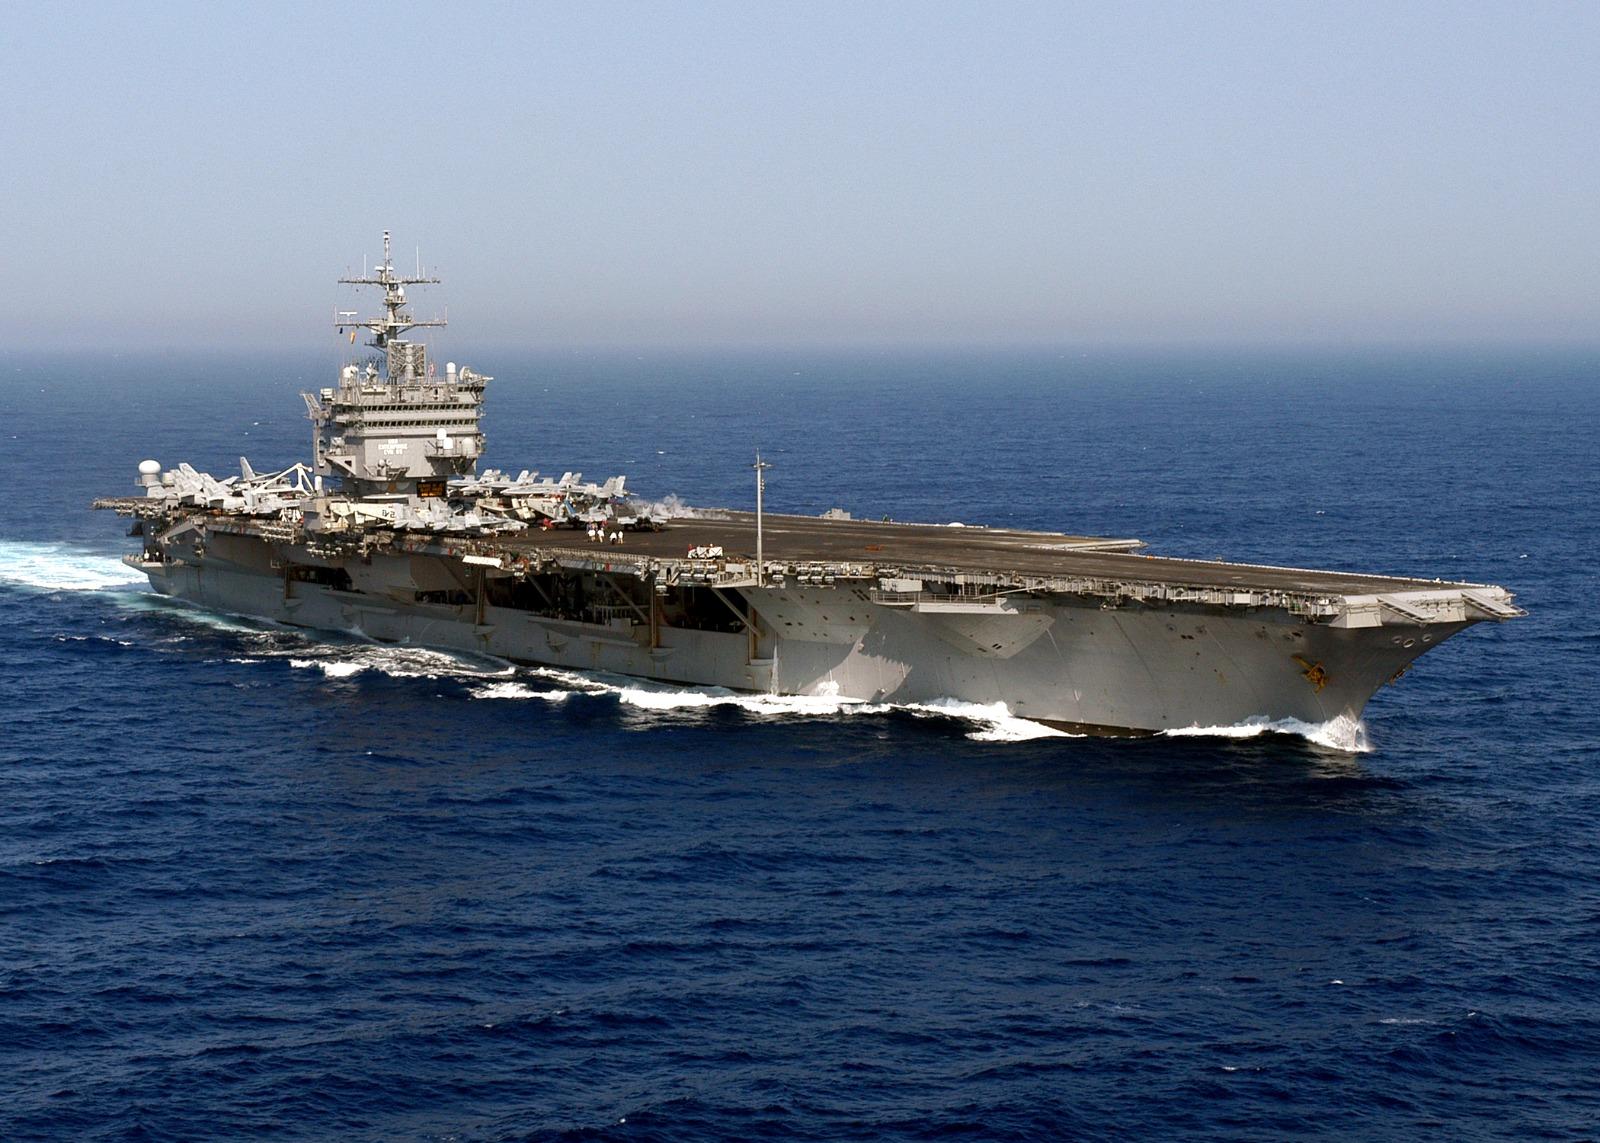 Single Rocket Attack Nearly Cost the U.S. Navy Billions of Dollars